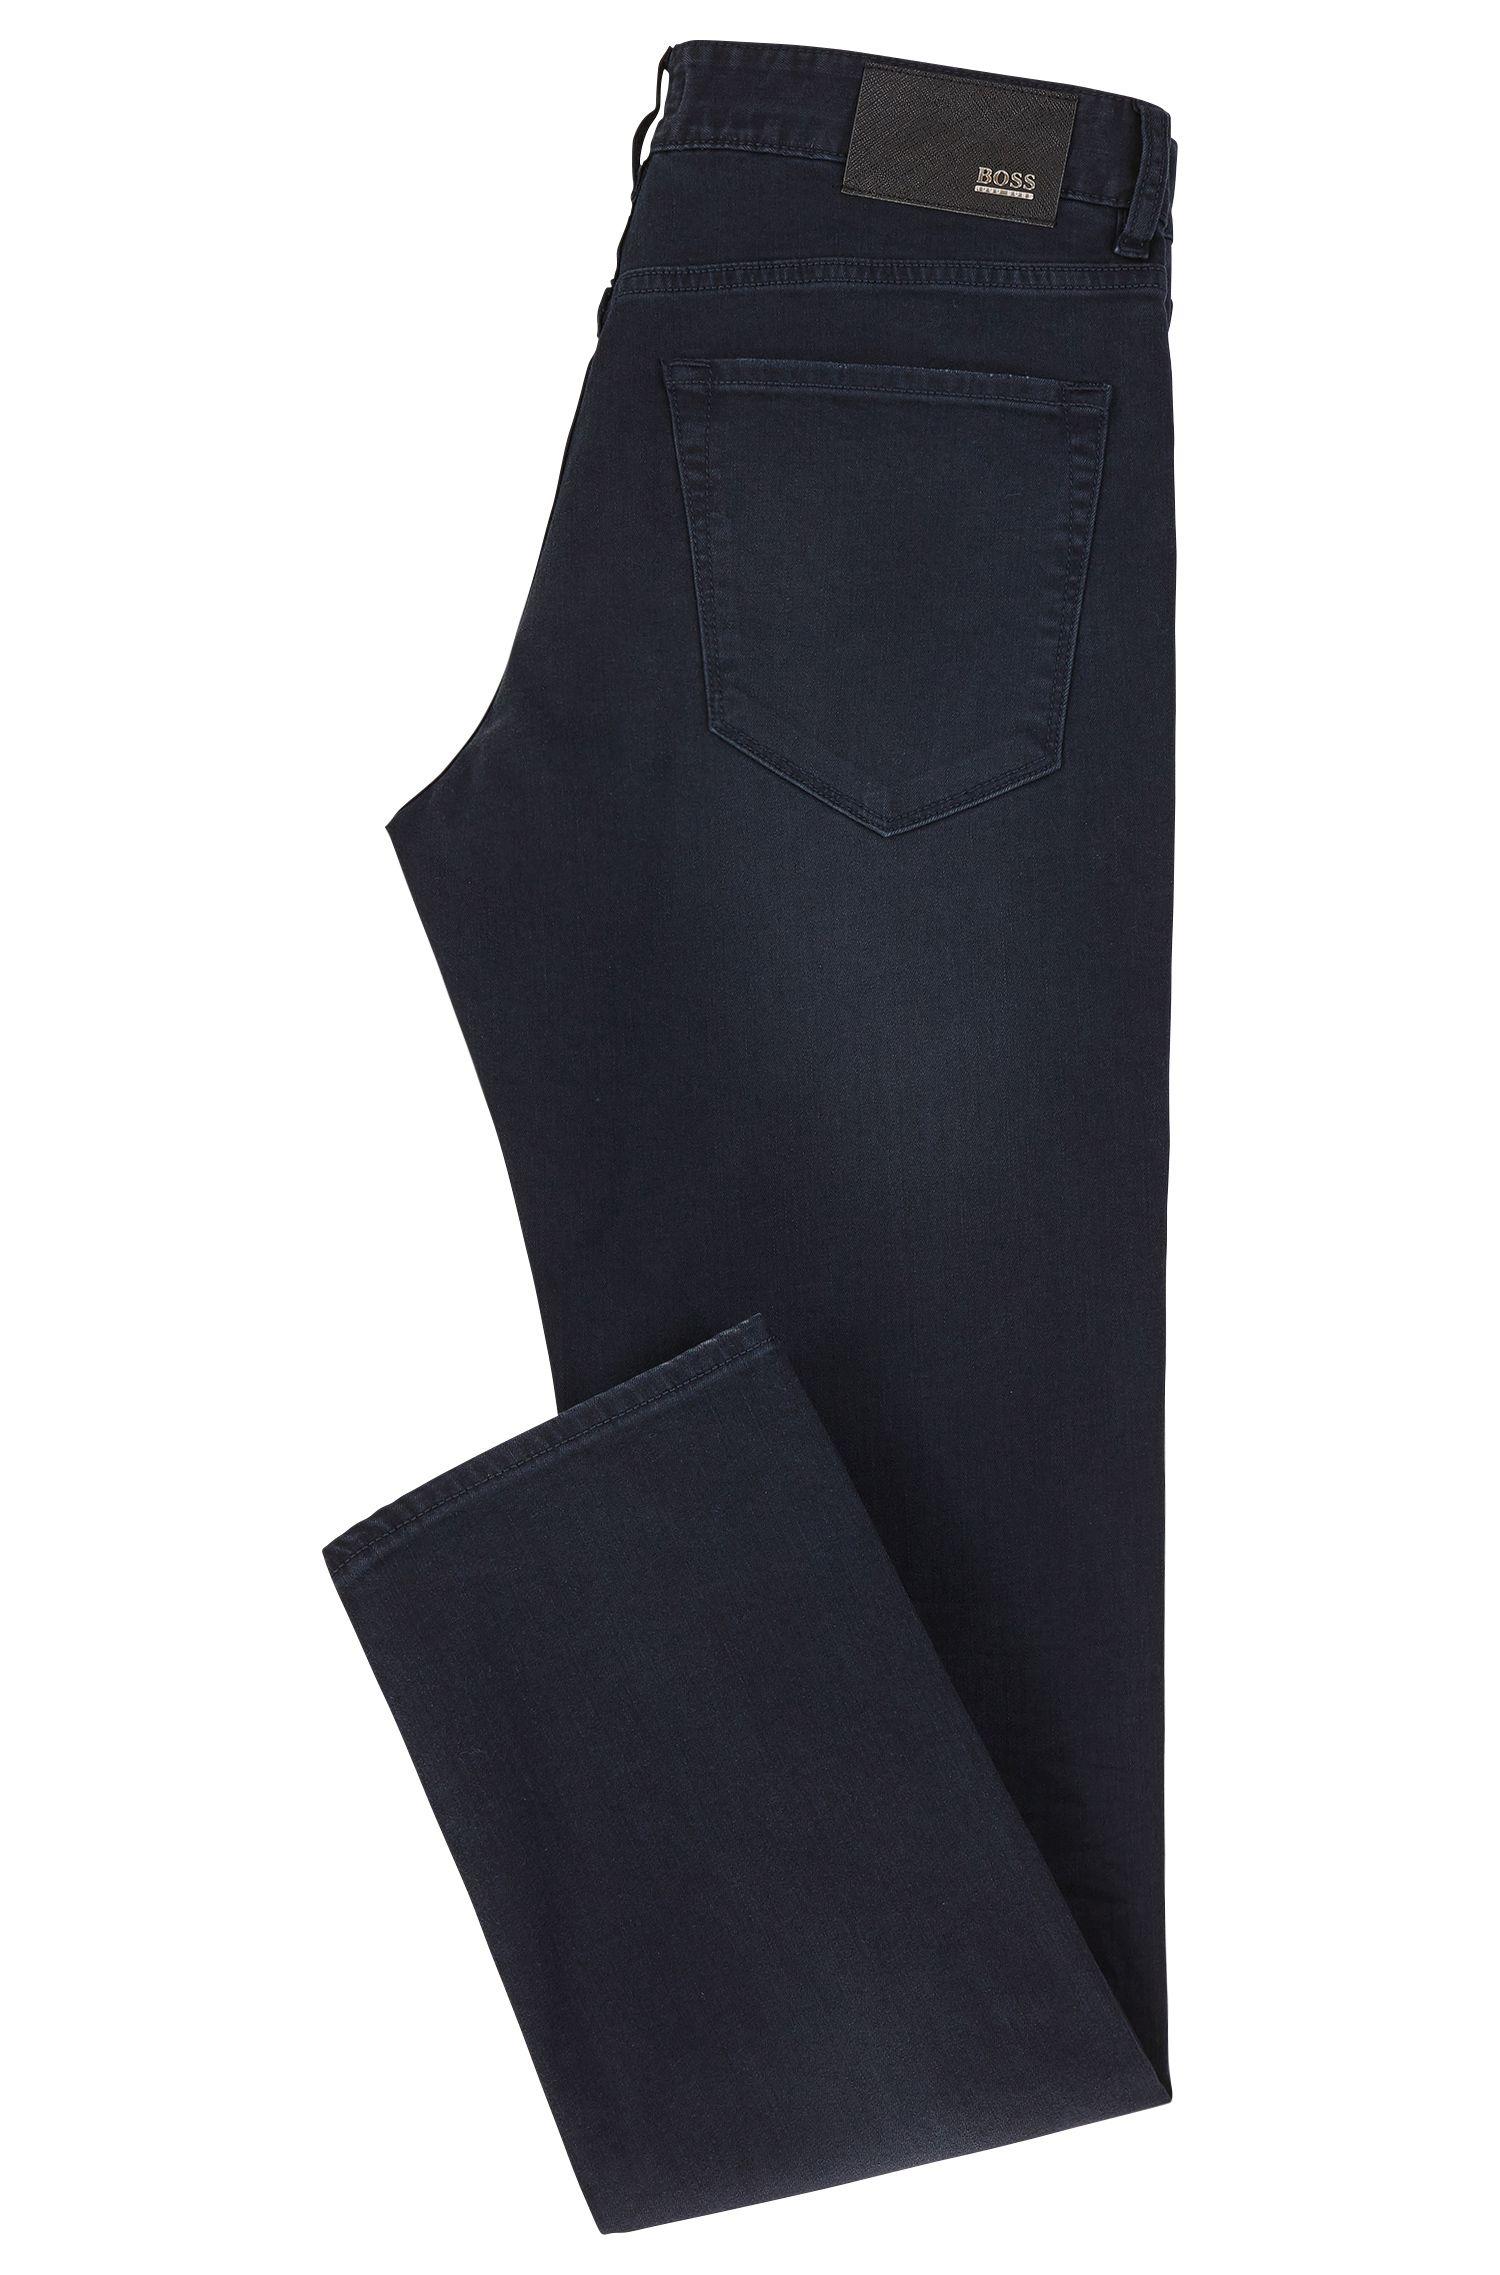 9.5 oz Stretch Cotton Blend Jeans, Regular Fit | Maine, Dark Blue